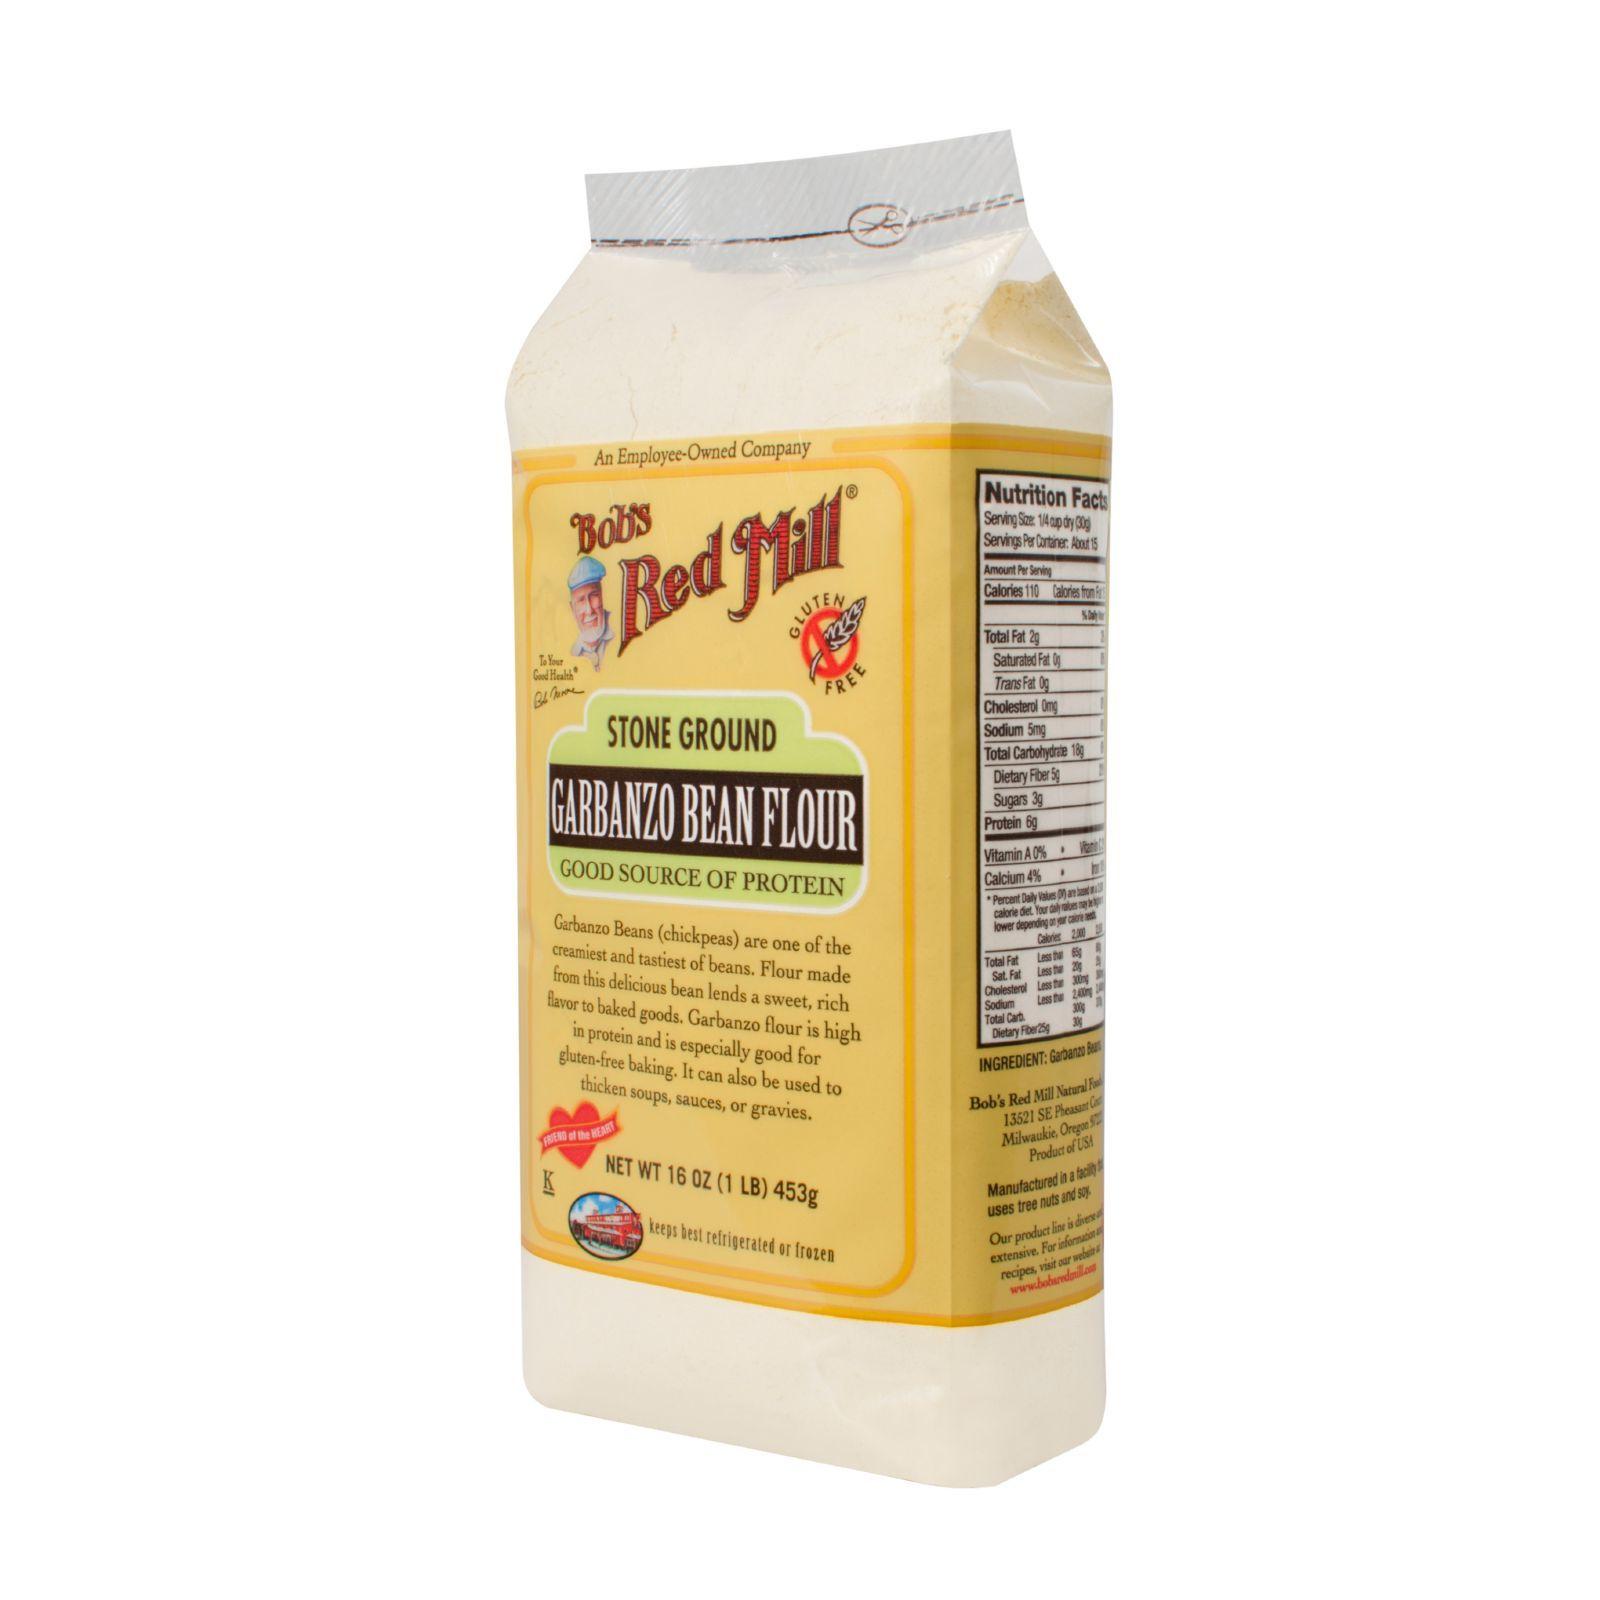 Bob's Red Mill Garbanzo Bean Flour - 16 oz - Case of 4